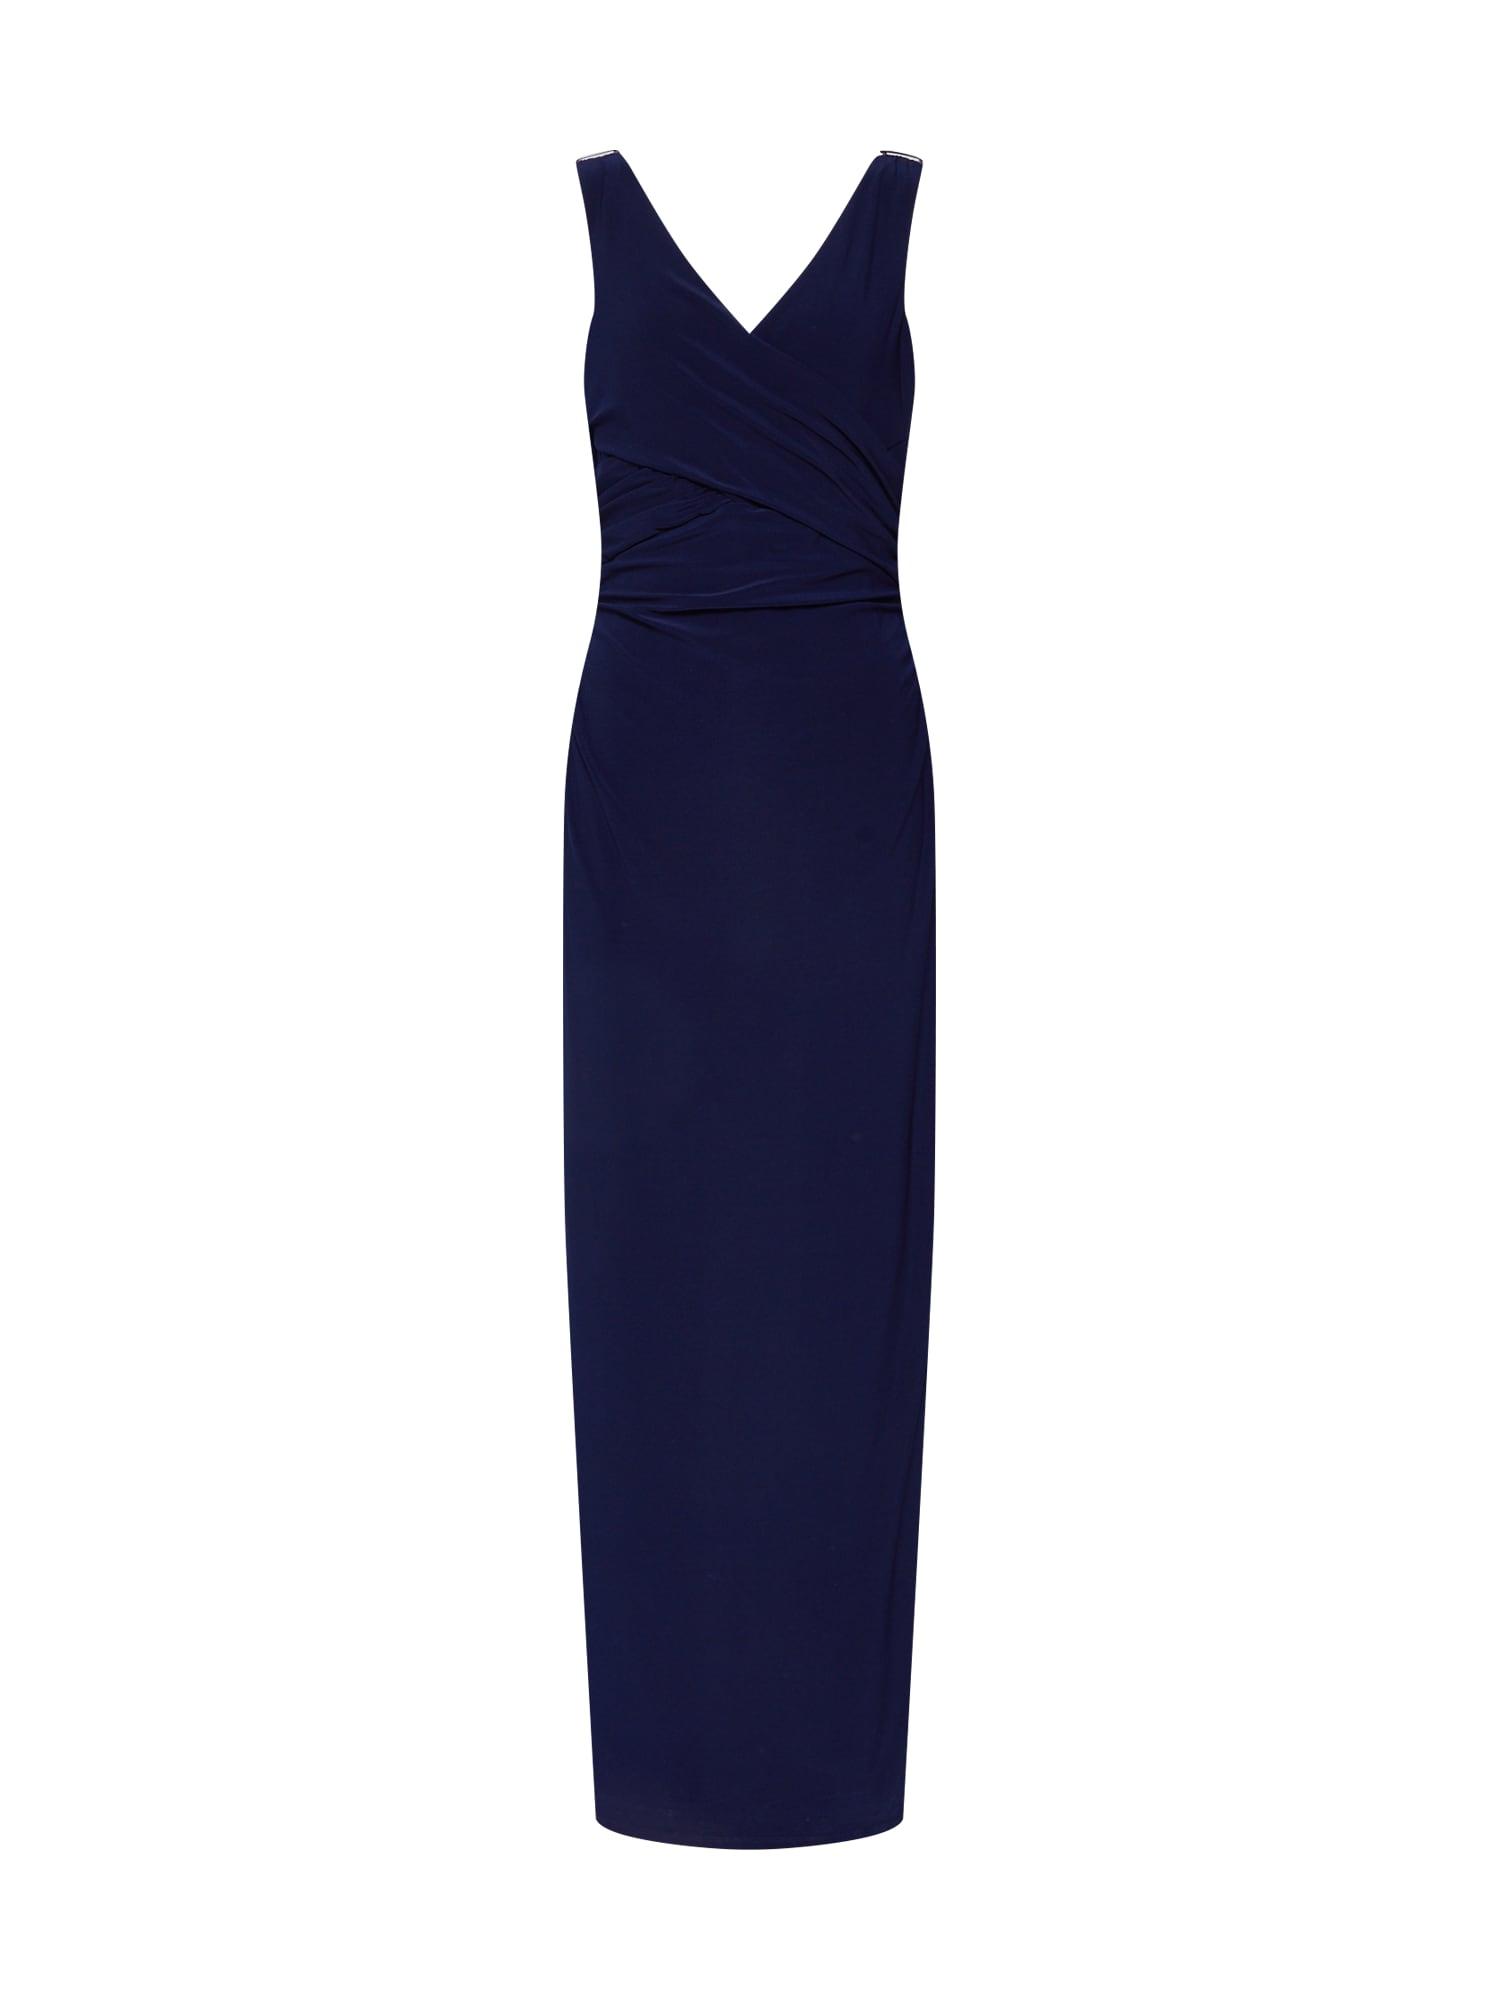 Společenské šaty JARLANNAH námořnická modř Lauren Ralph Lauren